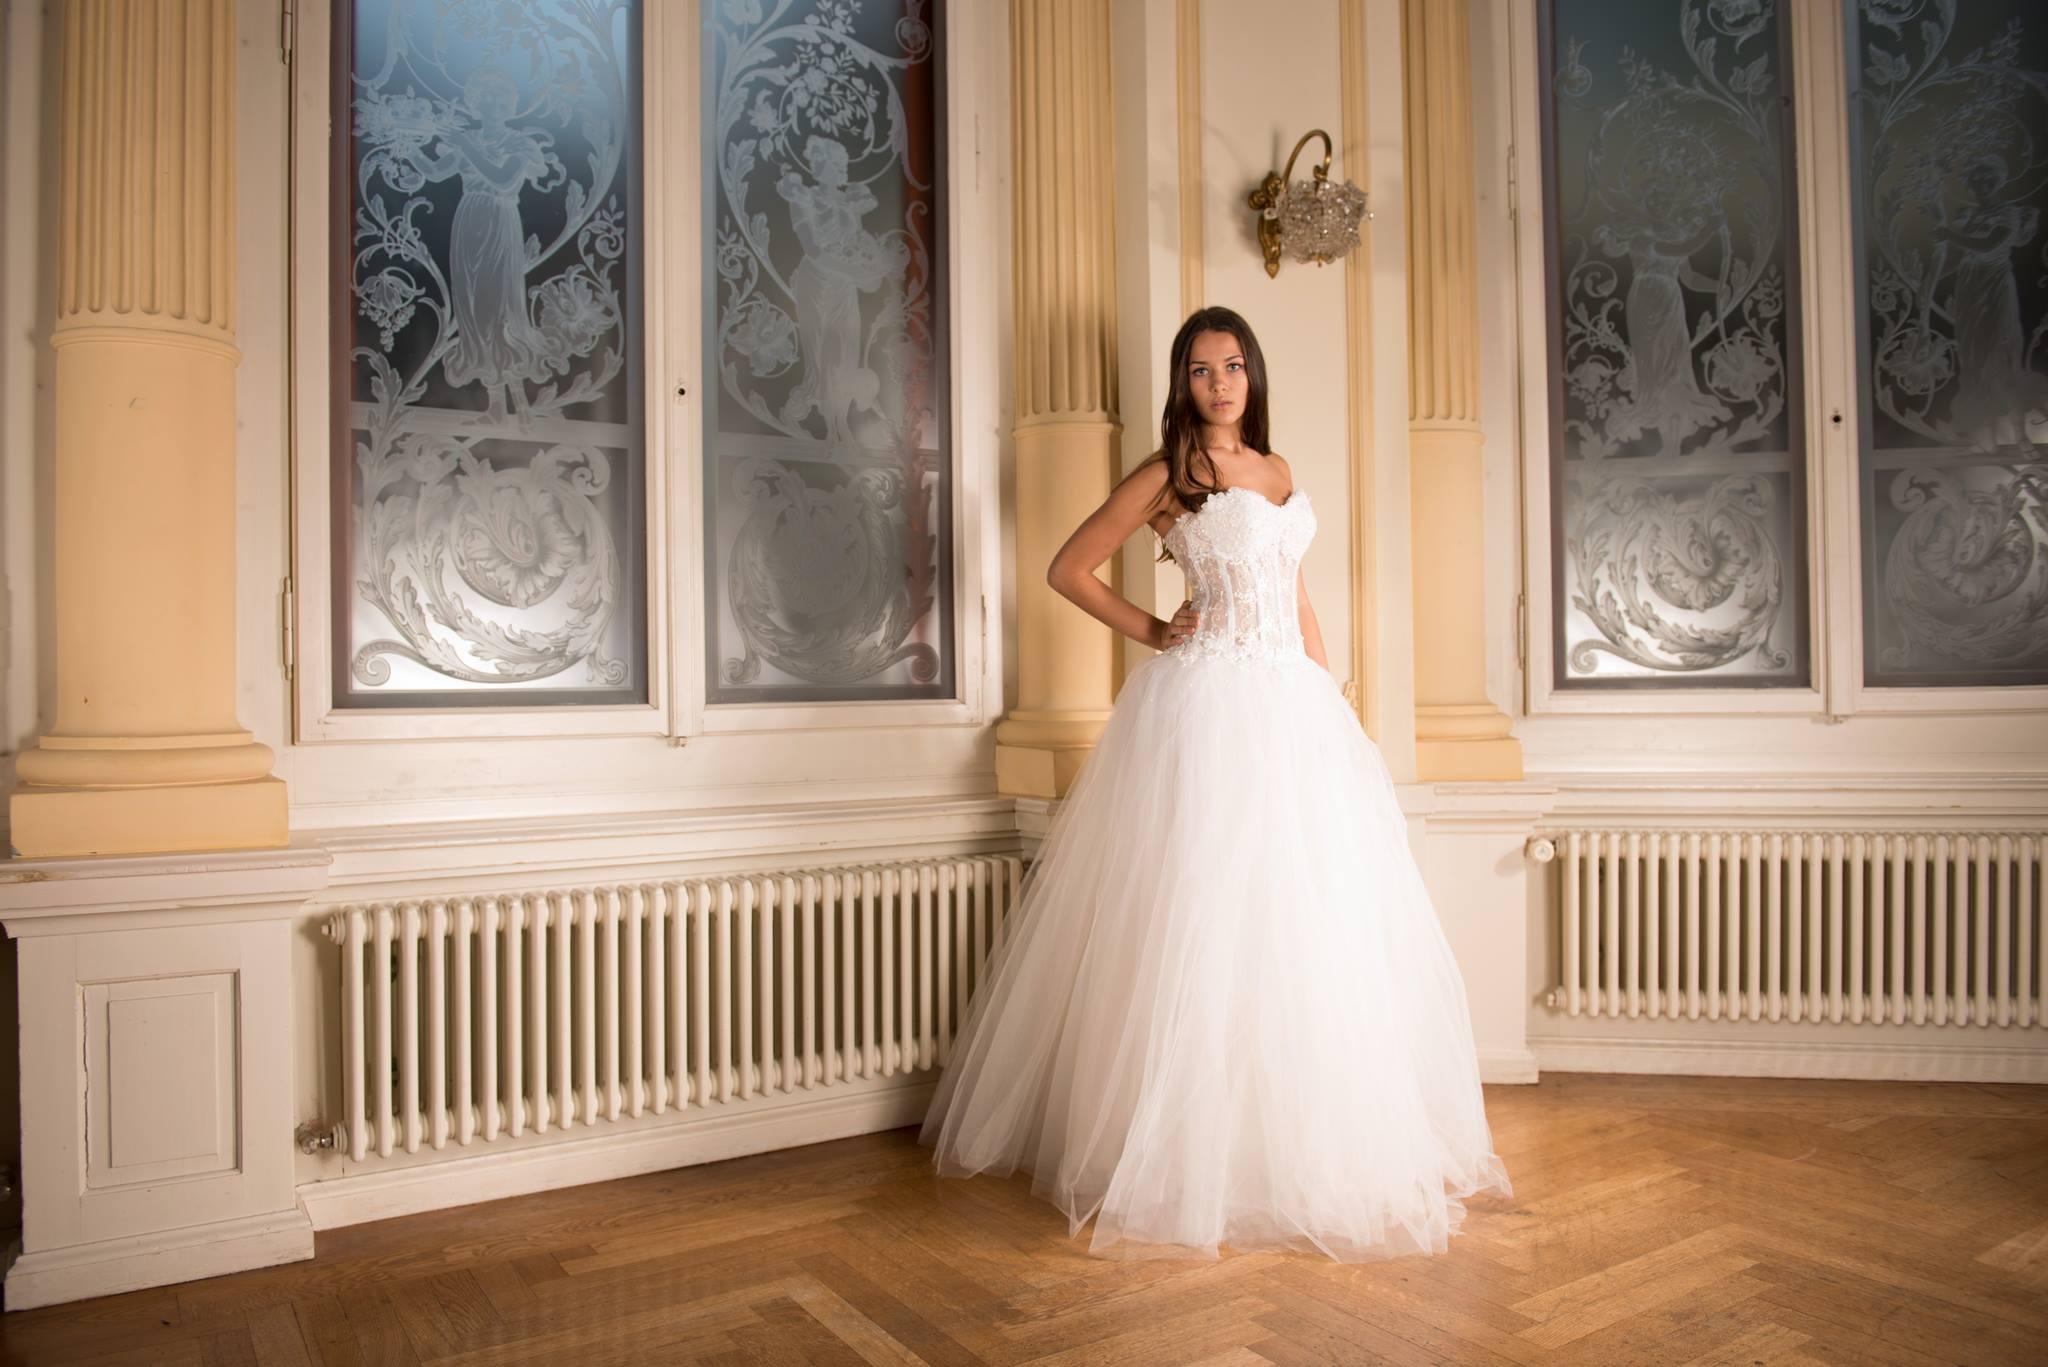 Free Images : Girl, Woman, Model, Fashion, Wedding Dress